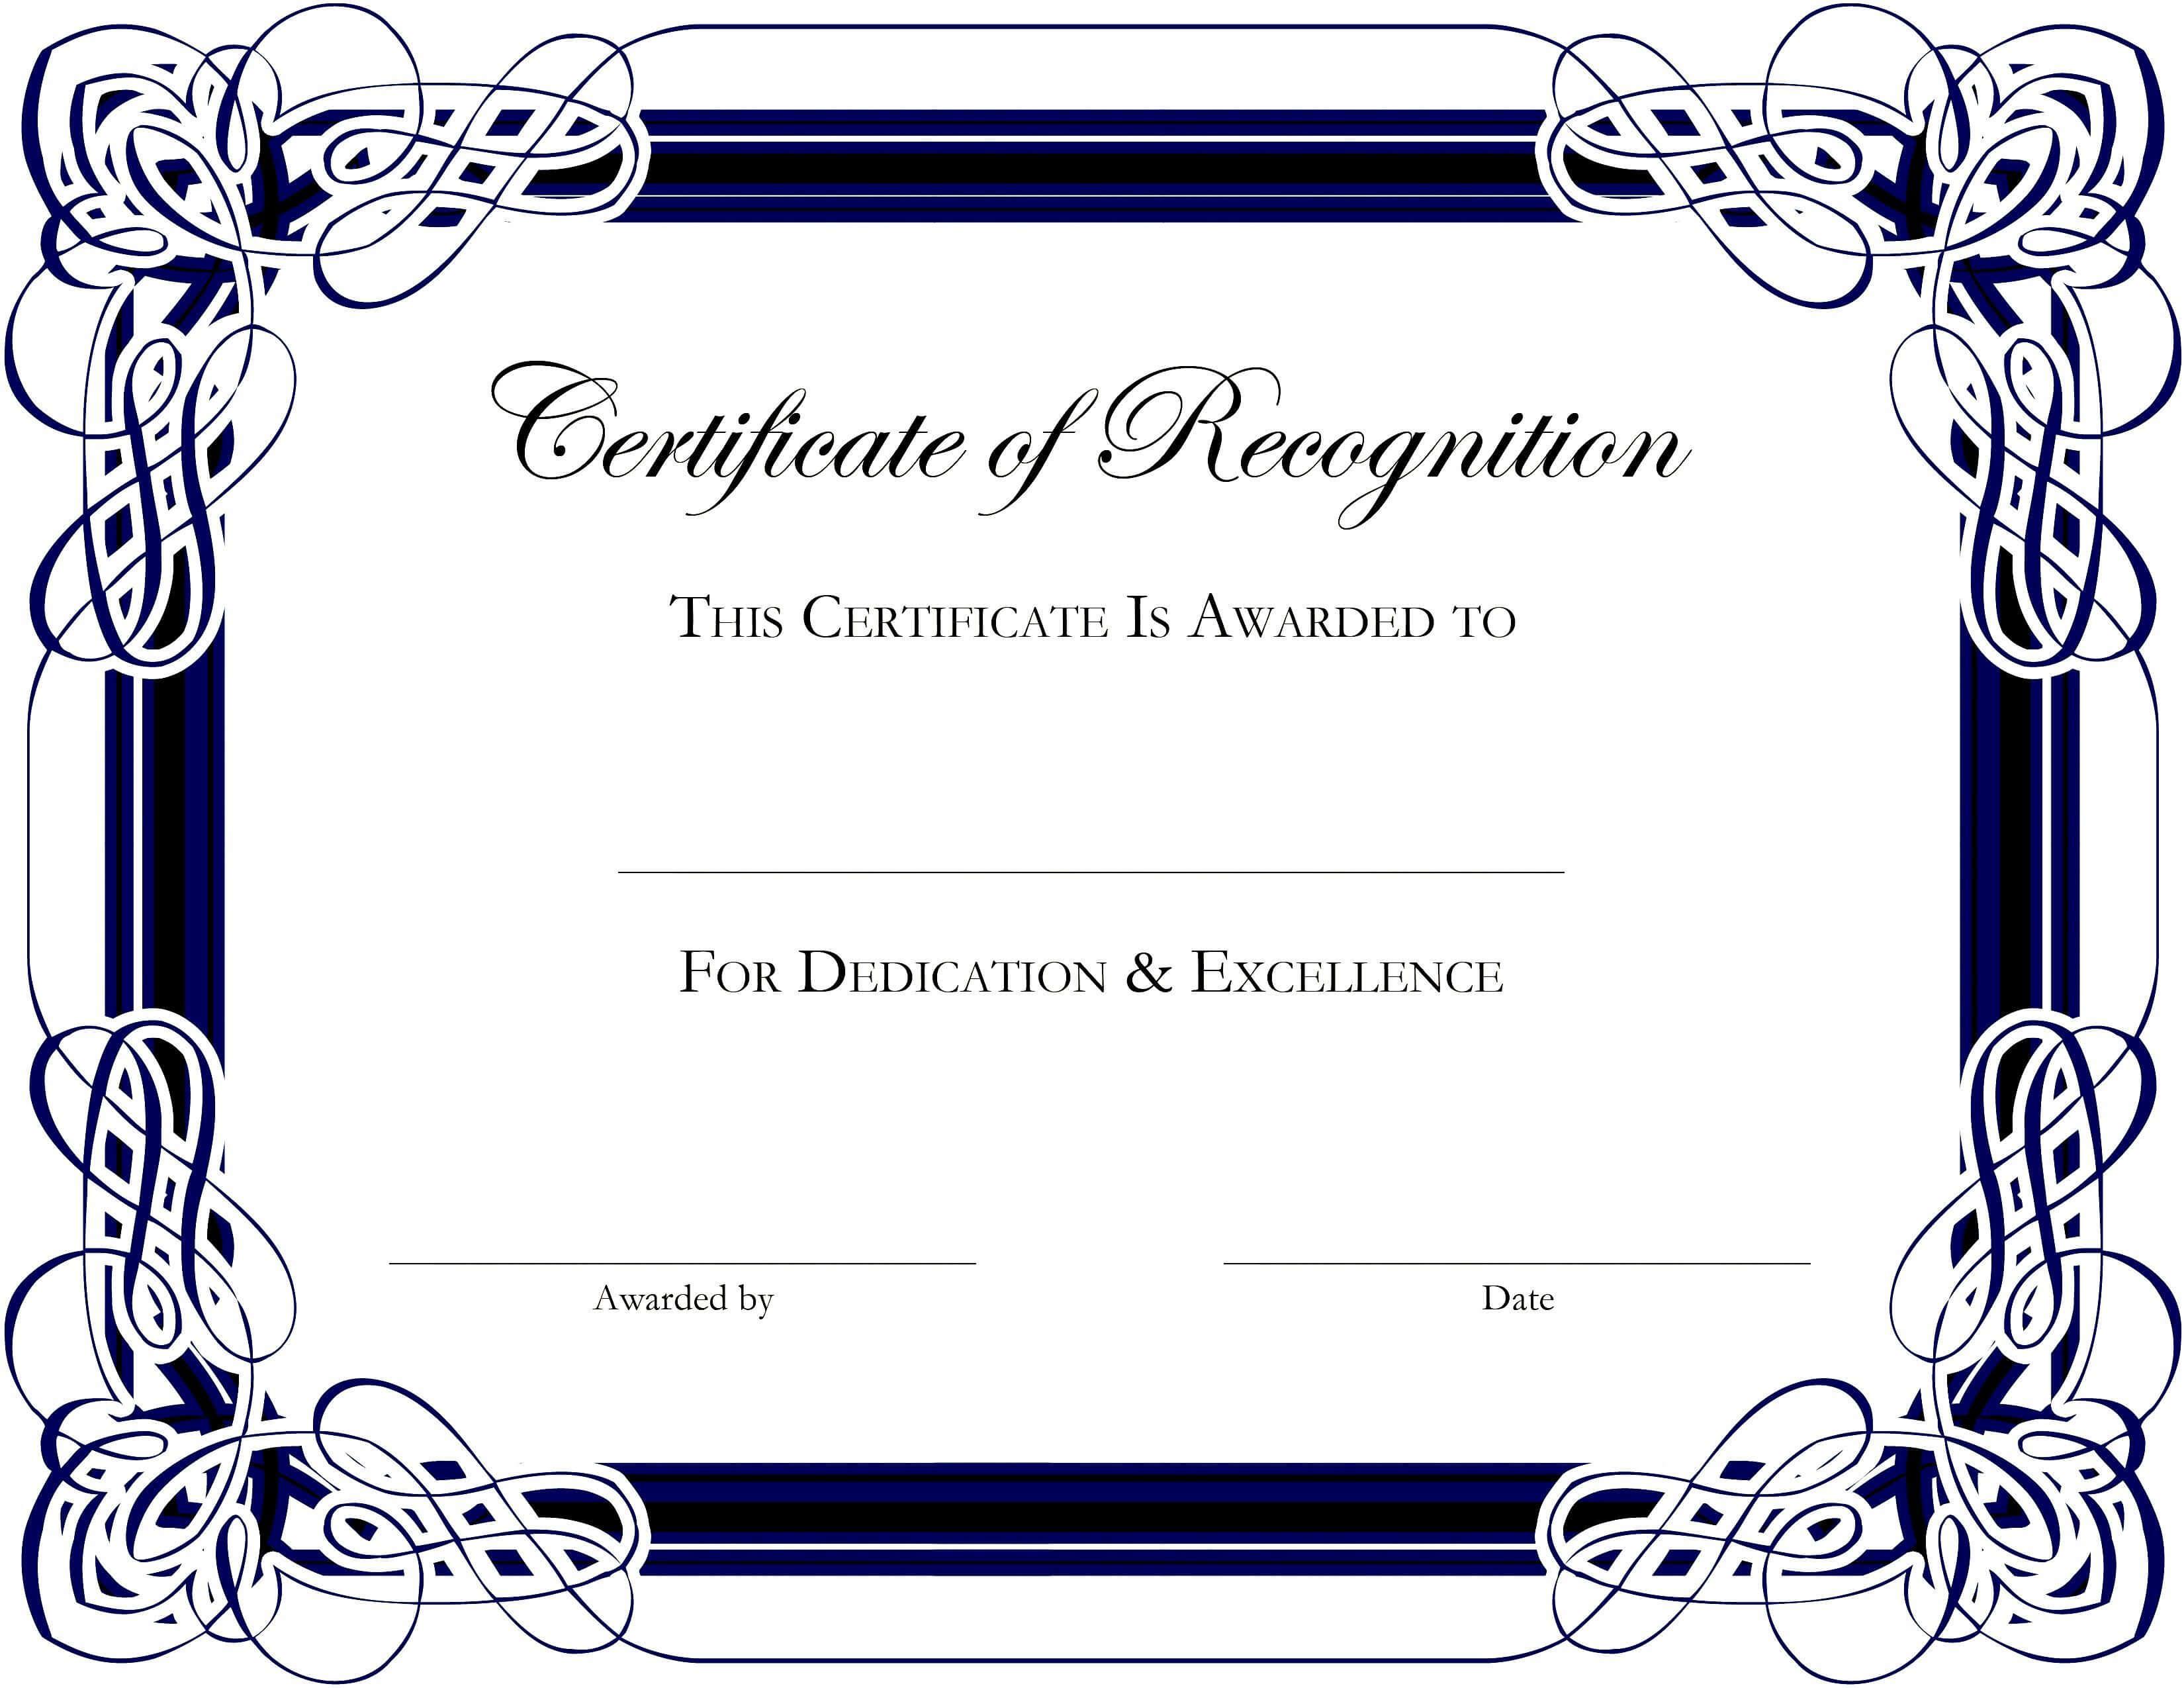 Award Templates For Microsoft Publisher | Besttemplate123 Regarding Award Certificate Border Template